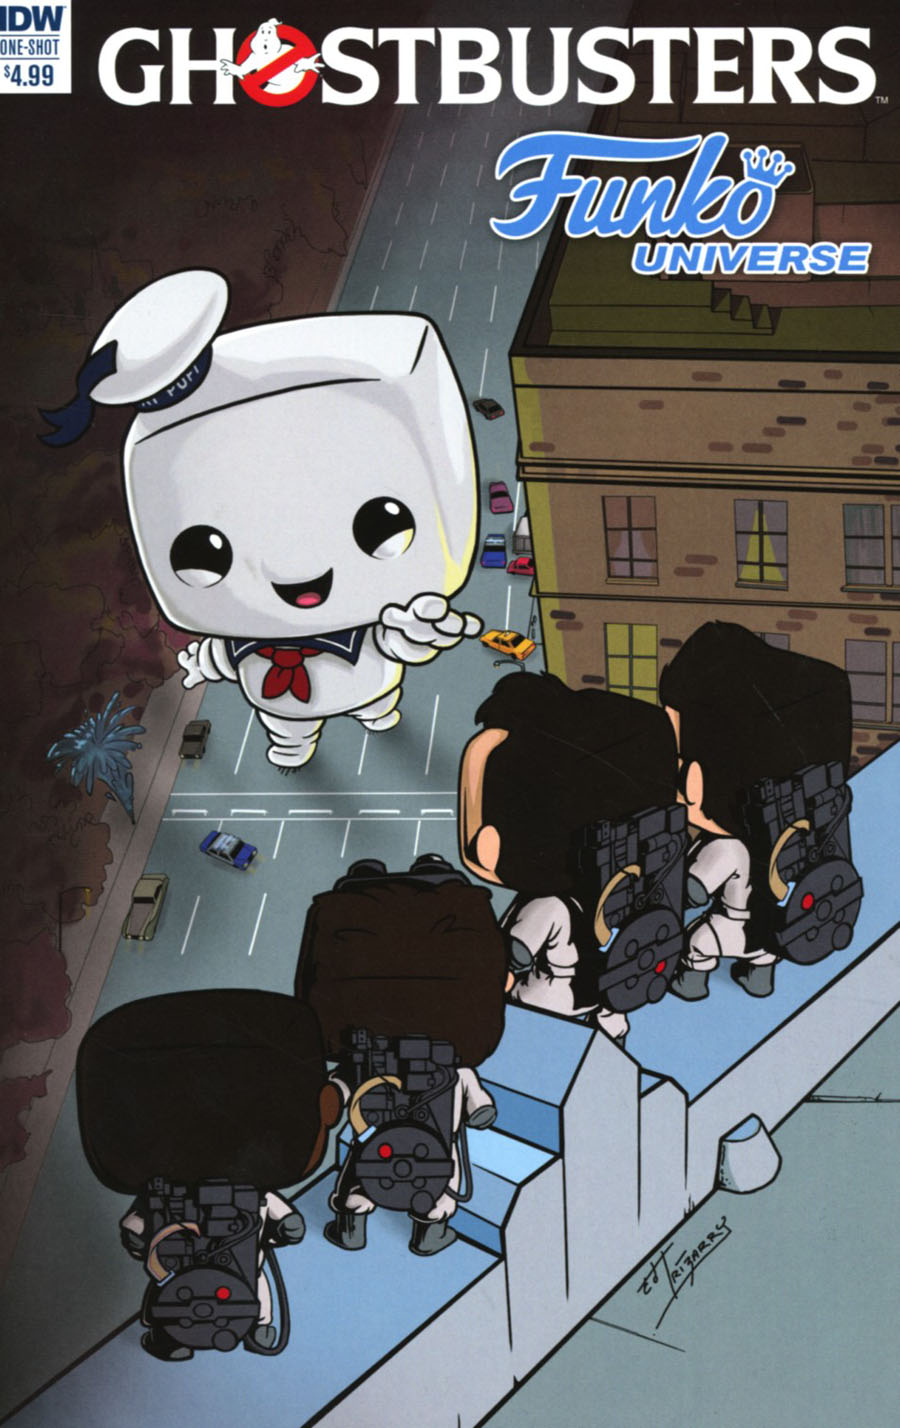 Ghostbusters Funko Universe Cover A Regular Eddie Irizarry Cover